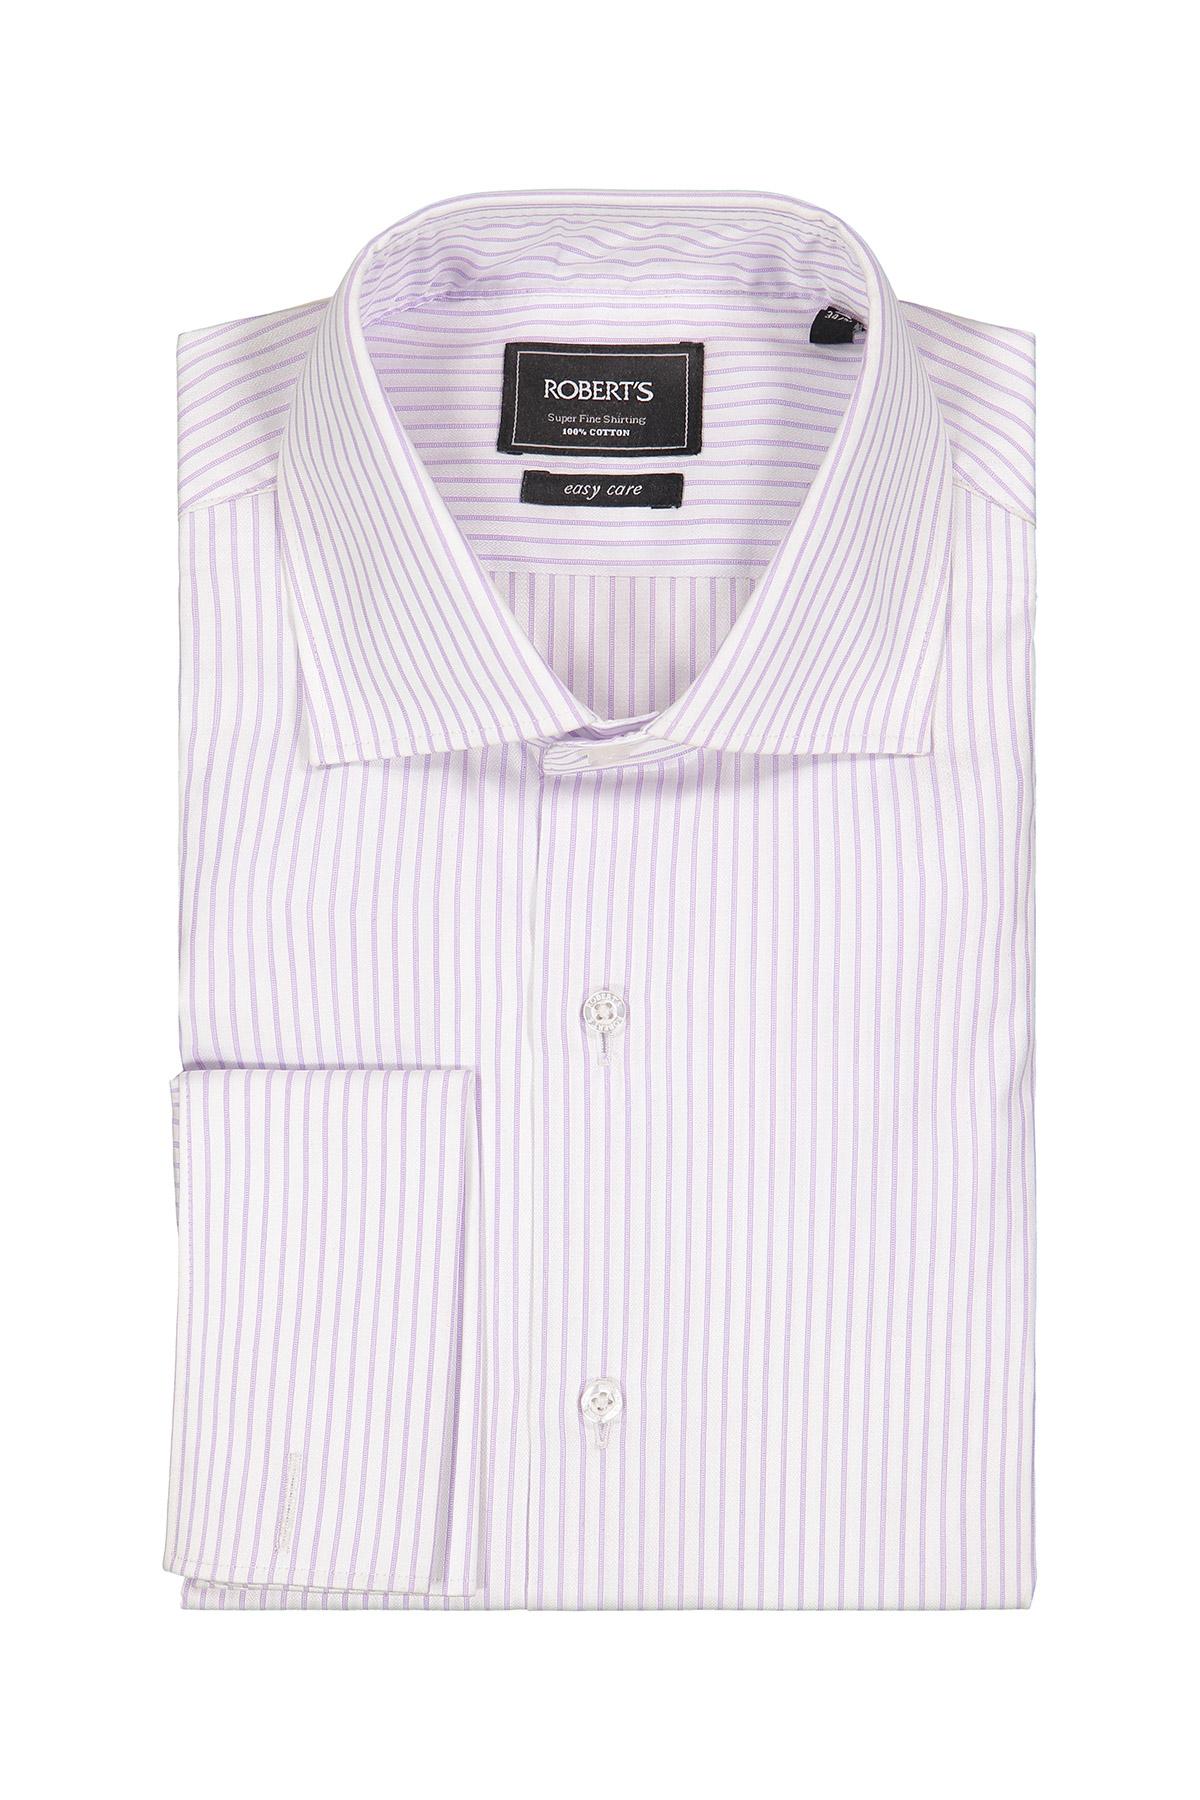 Camisa Robert´s, Easy Care, blanca con rayas lila, cuello italiano.